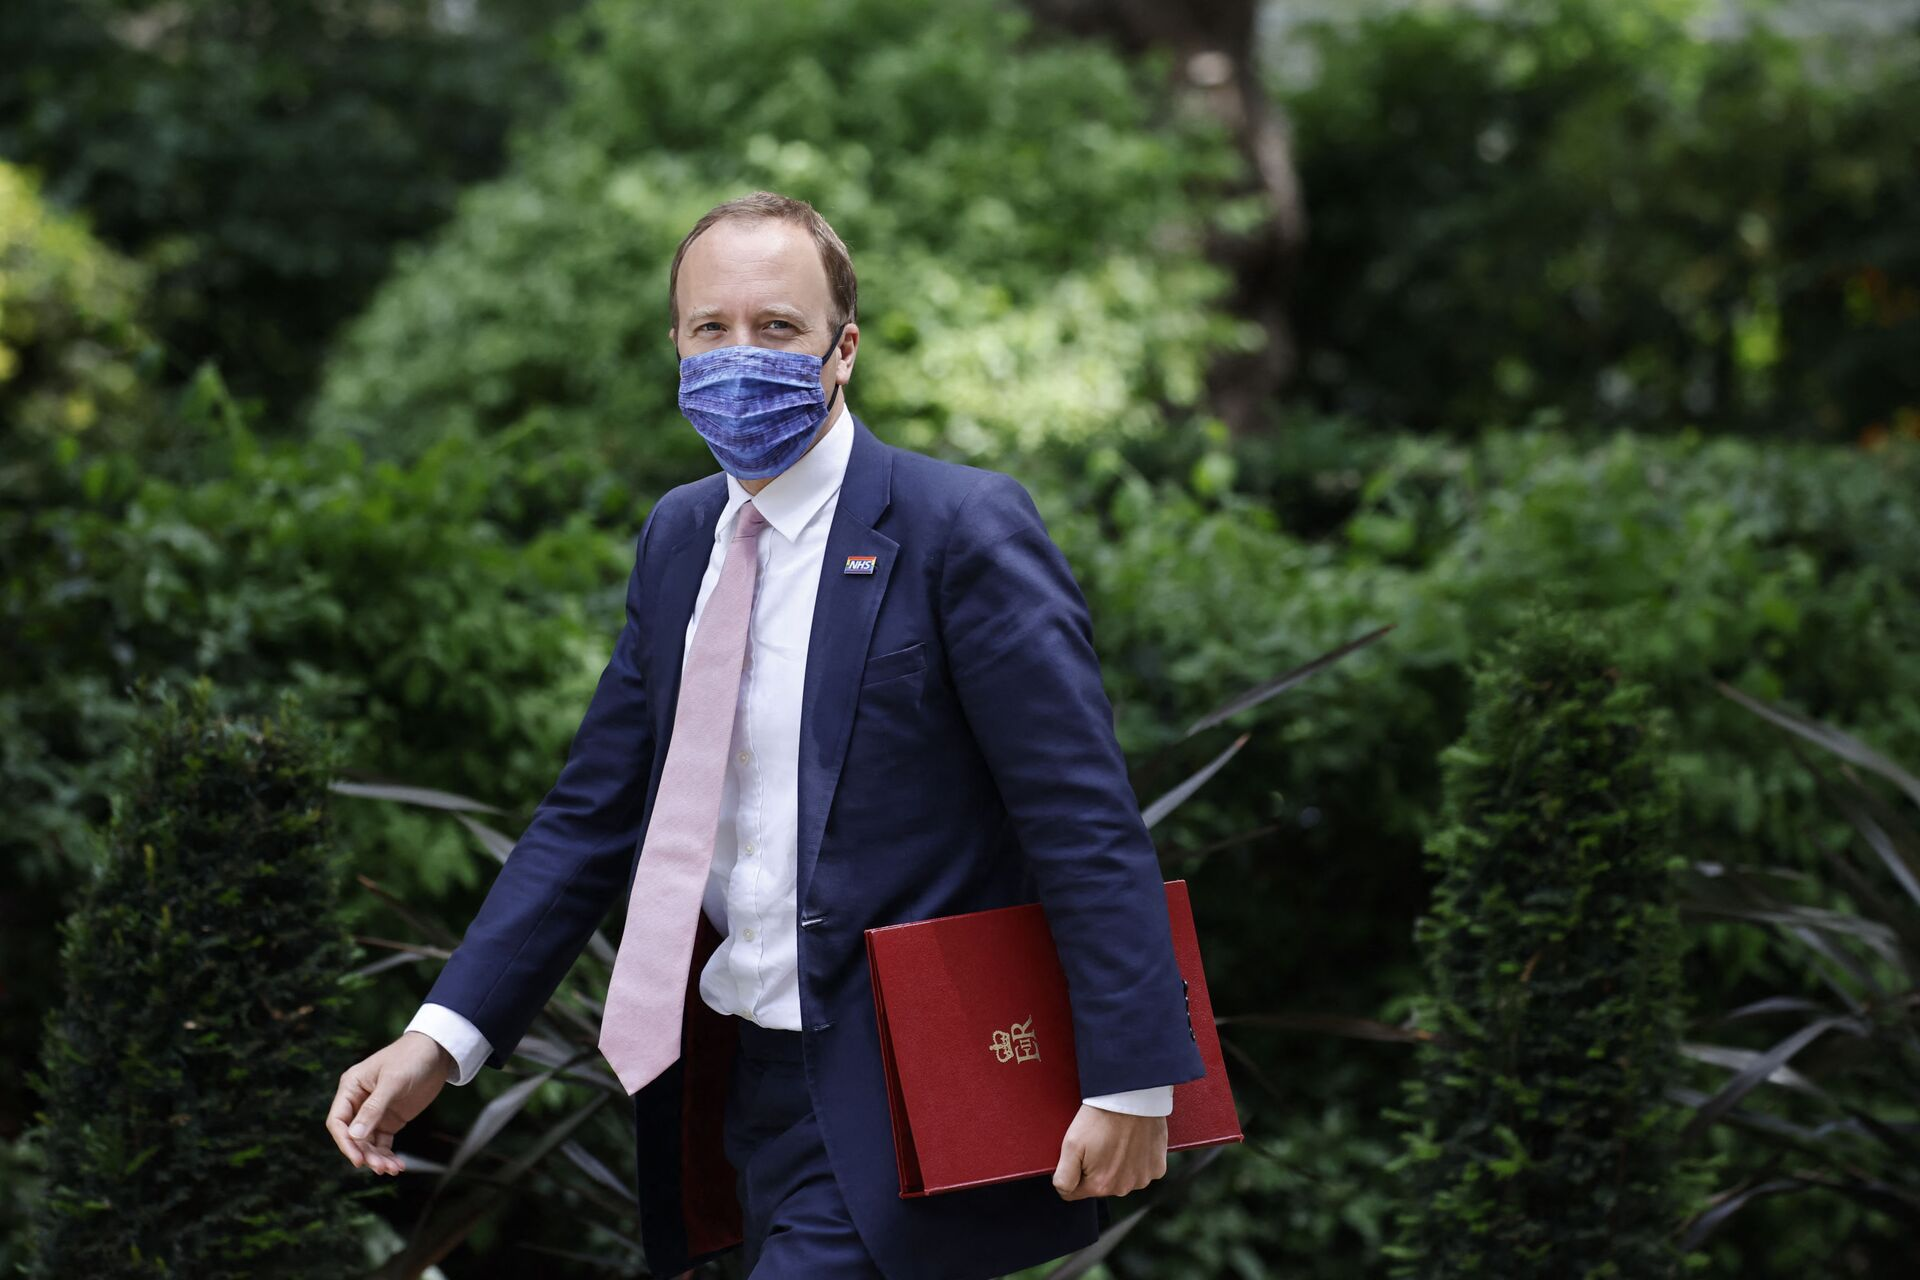 Britain's Health Secretary Matt Hancock walks along Downing Street in central London on June 15, 2021 - Sputnik International, 1920, 07.09.2021